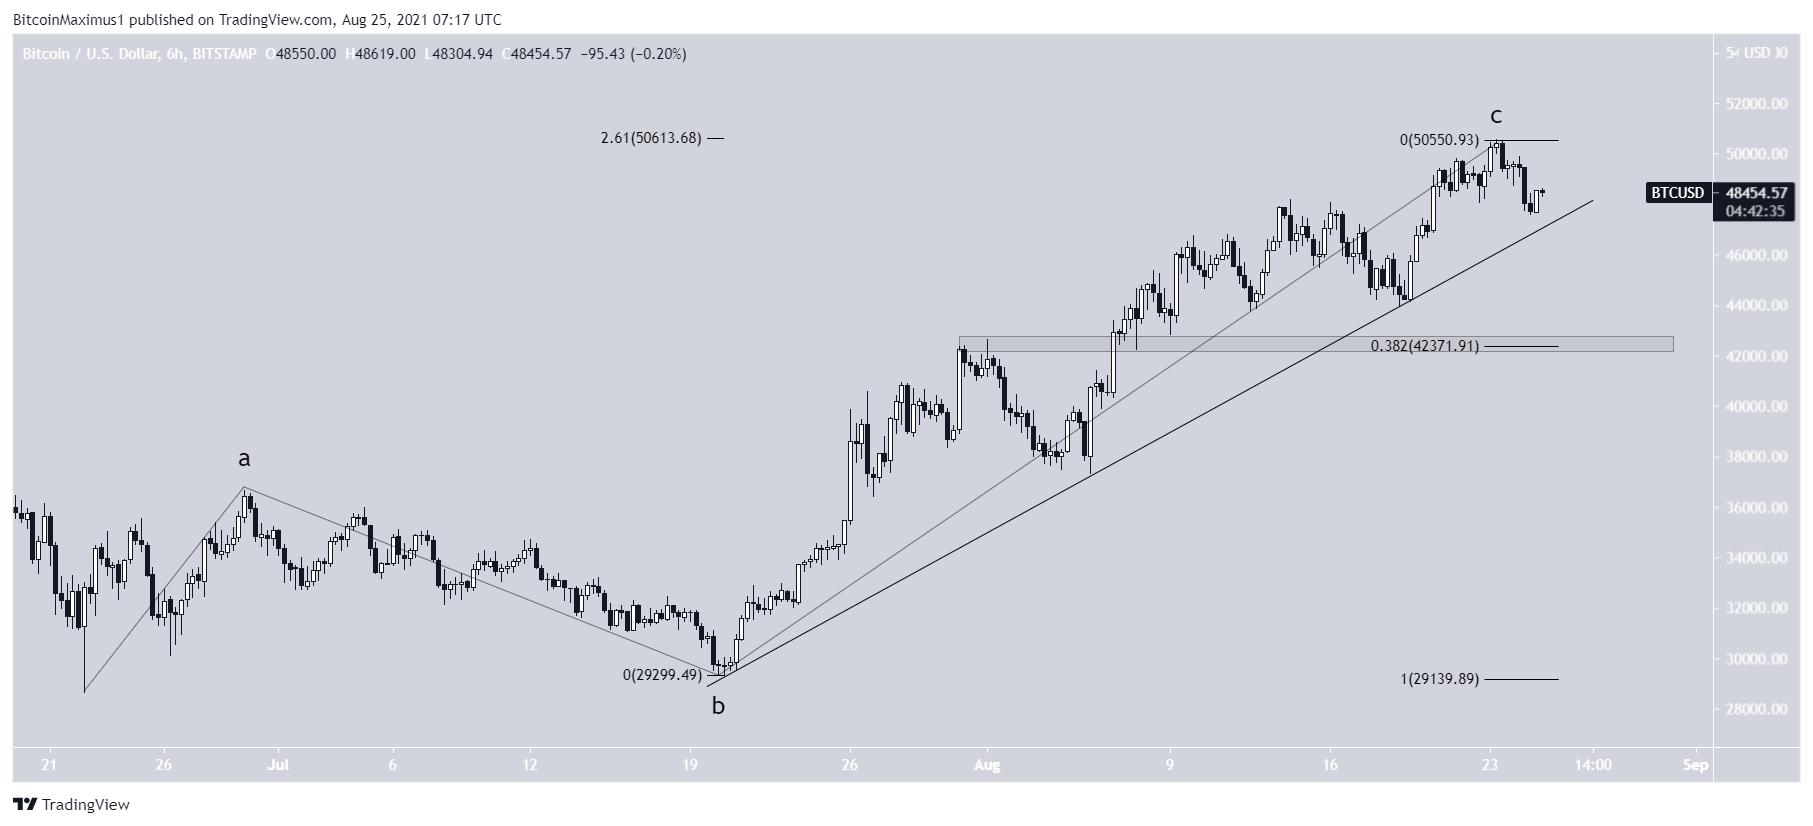 BTC Kurs Preis Chart Wellenanalyse 2 25.08.2021 Trading